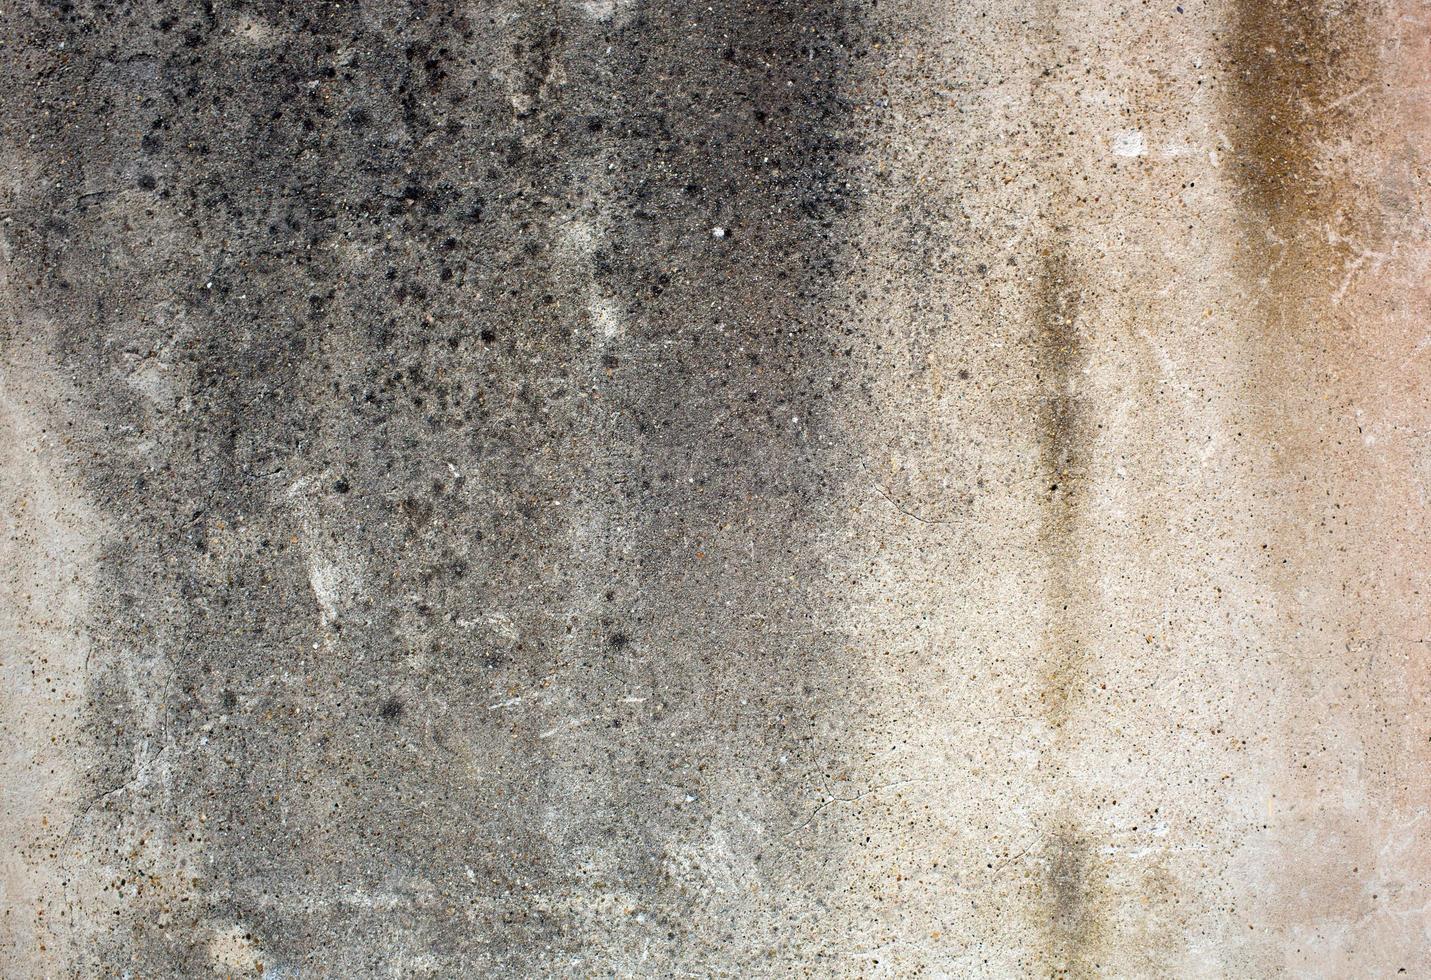 oude getextureerde betonnen wand foto